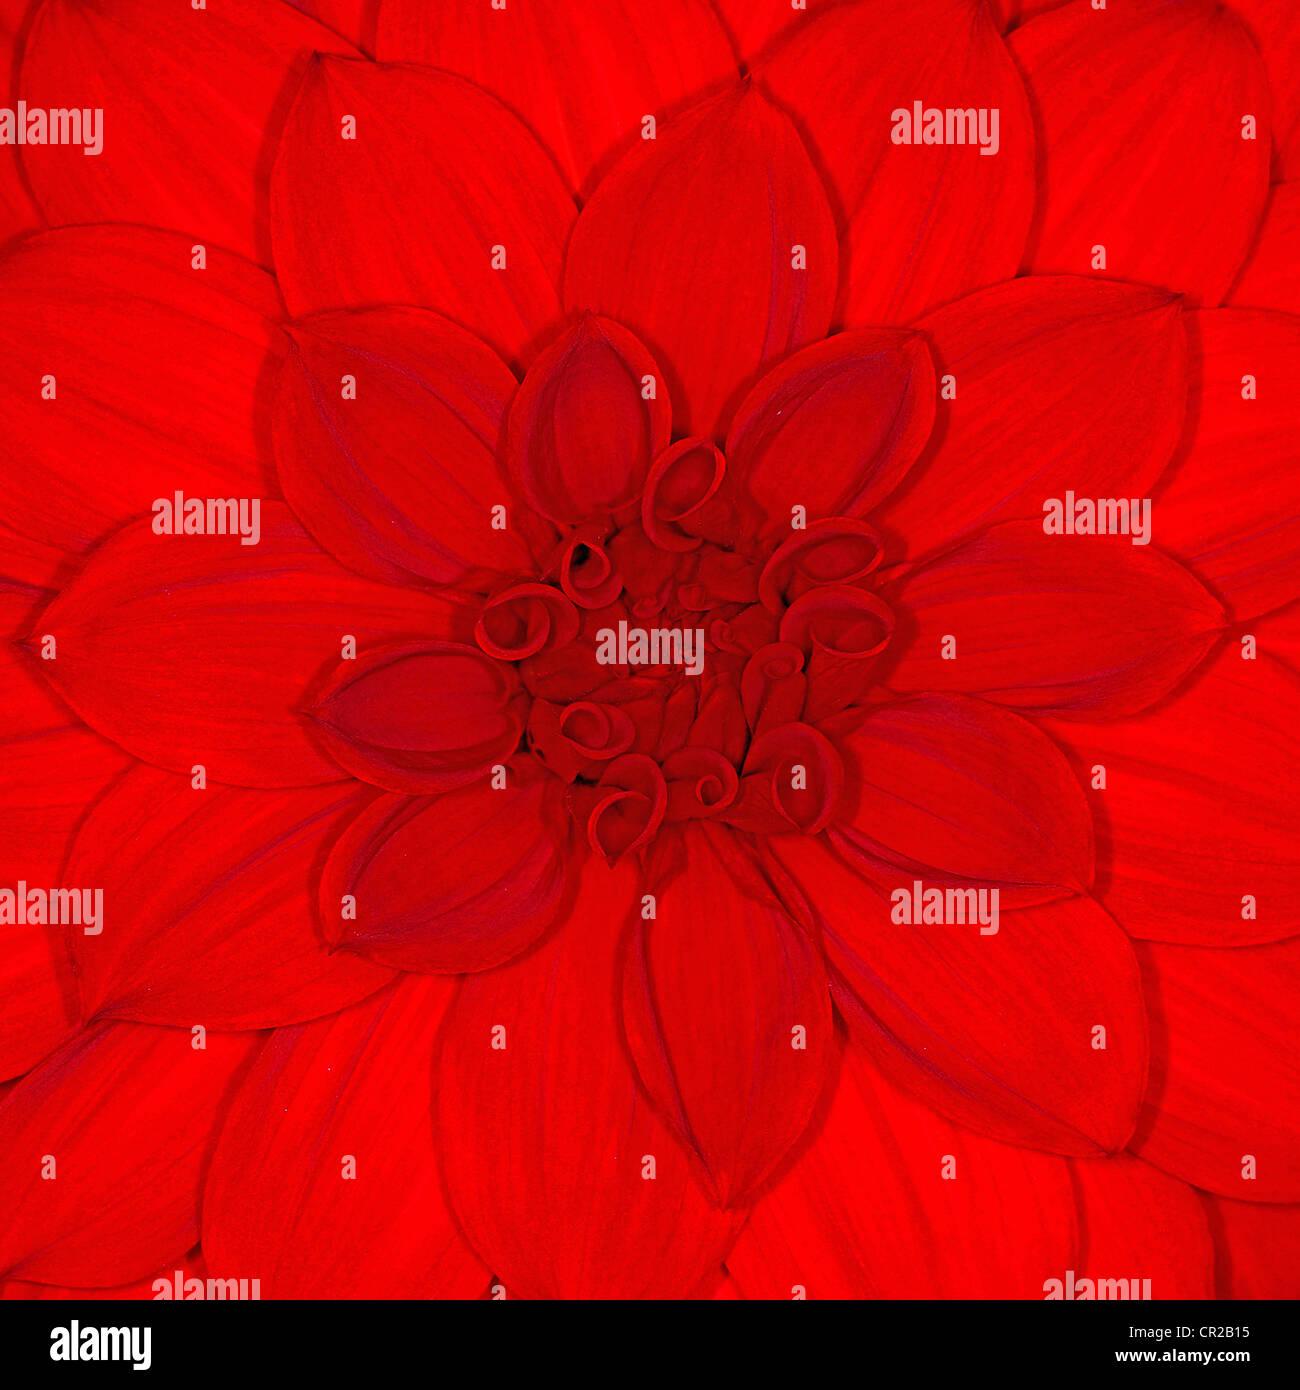 Red Dahlia flower close up - Stock Image